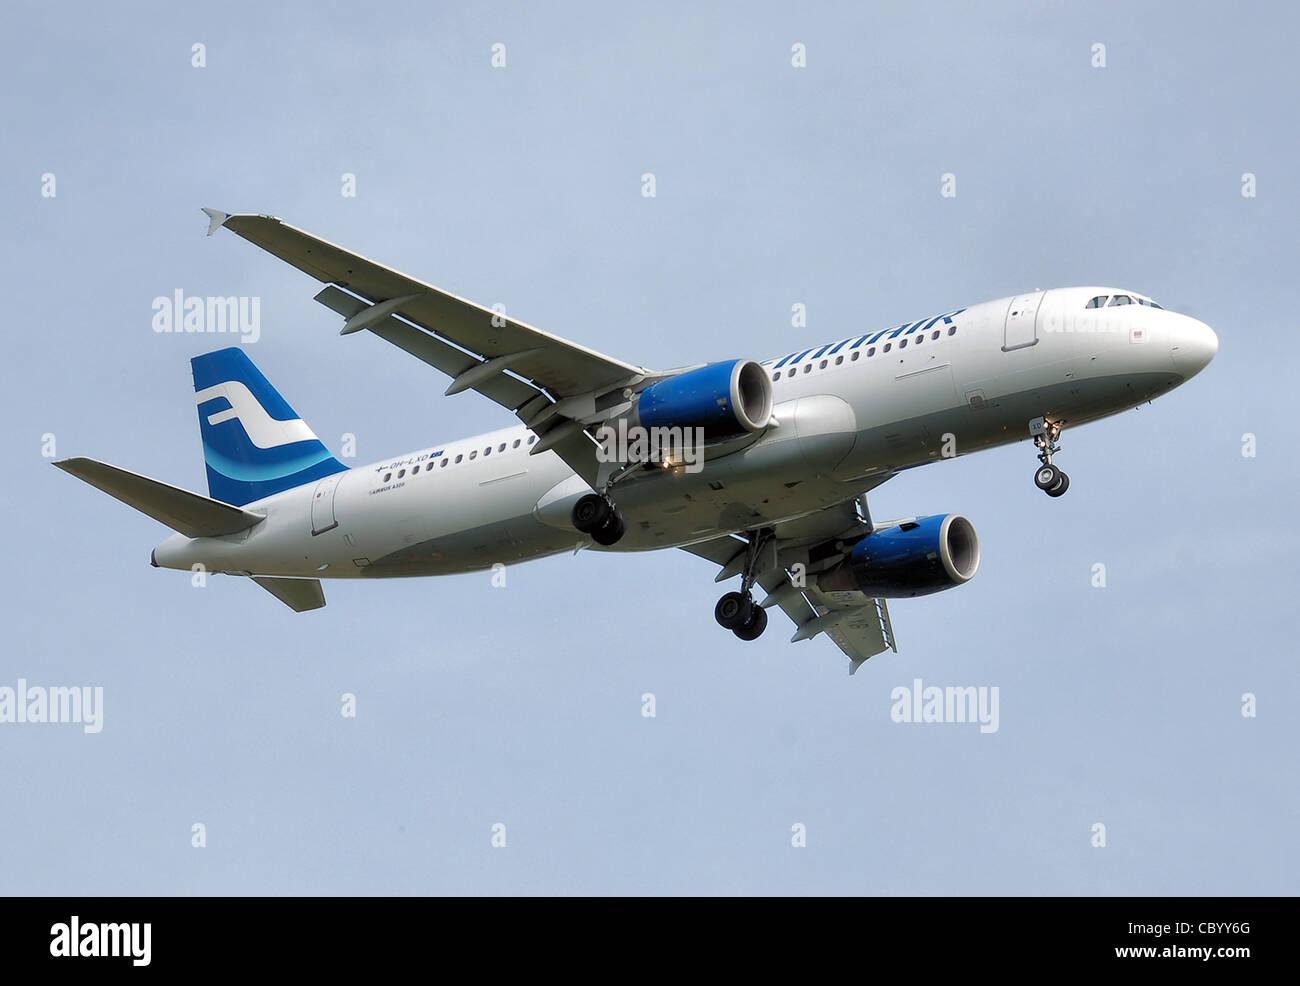 Finnair Airbus A320-200 (OH-LXD) lands at London Heathrow Airport, England. Stock Photo